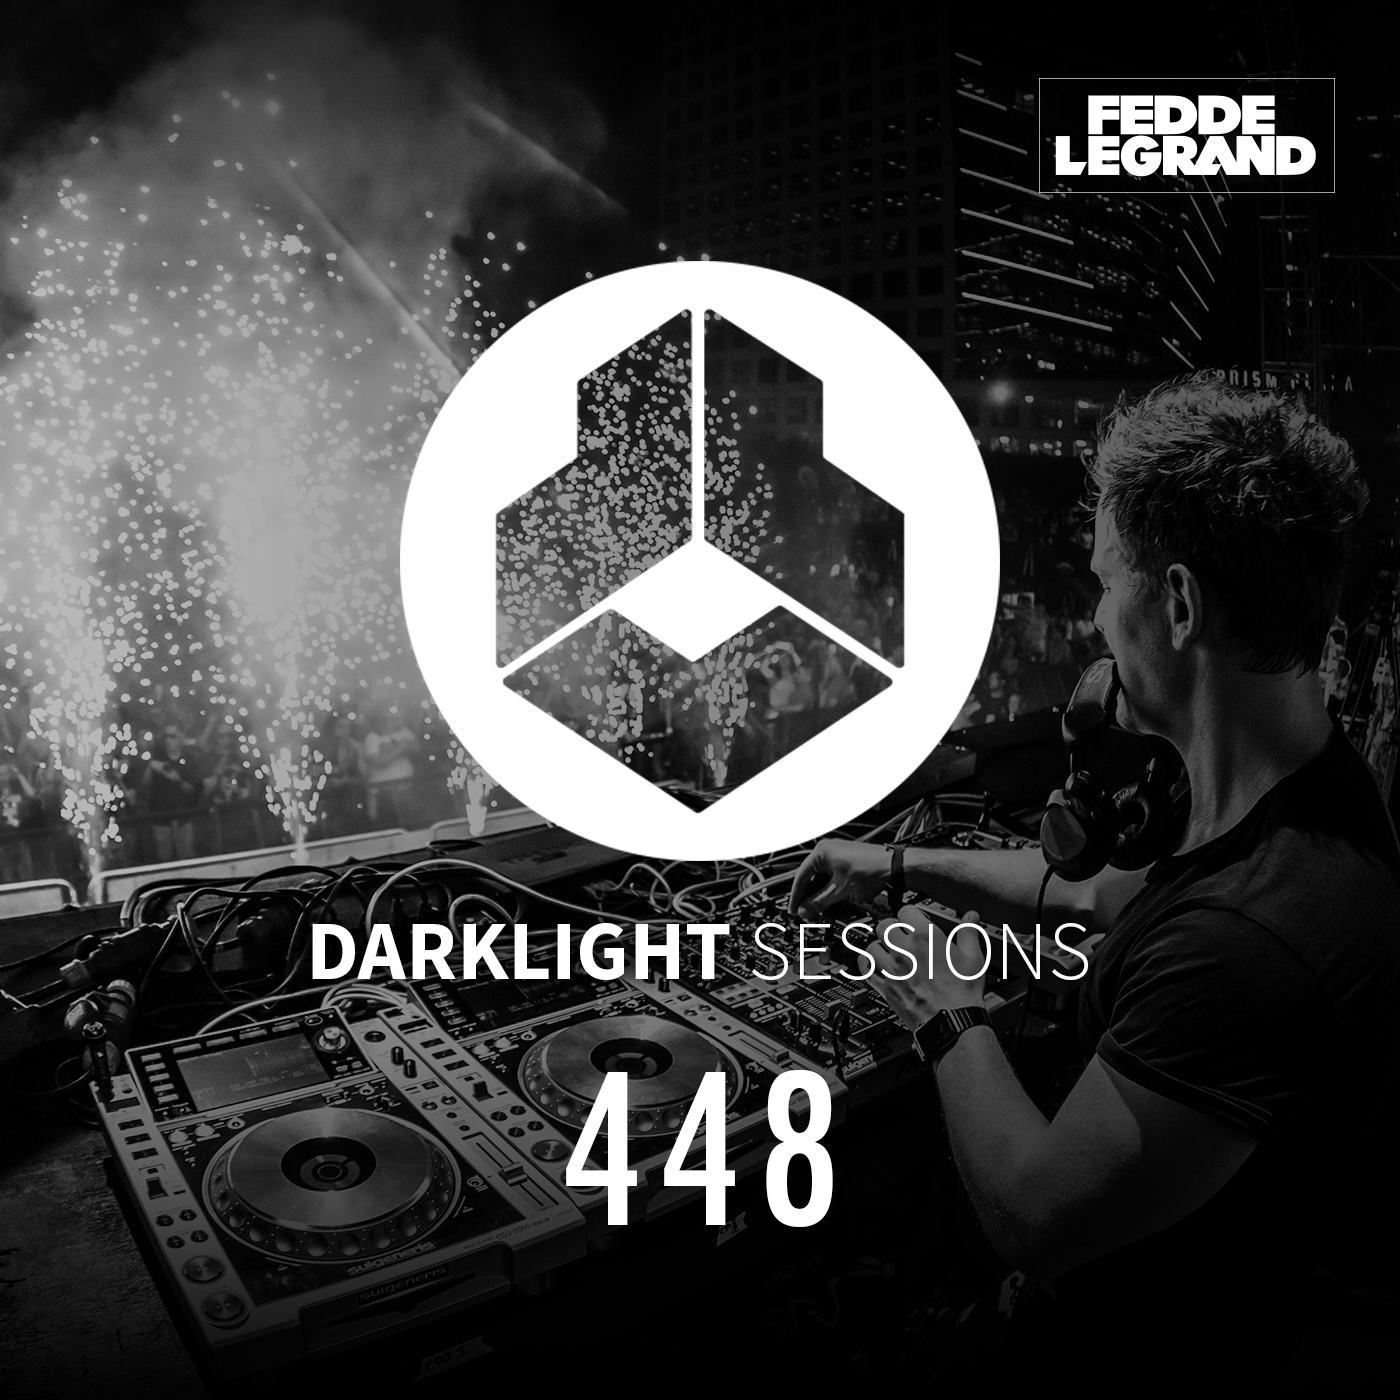 Darklight Sessions 448